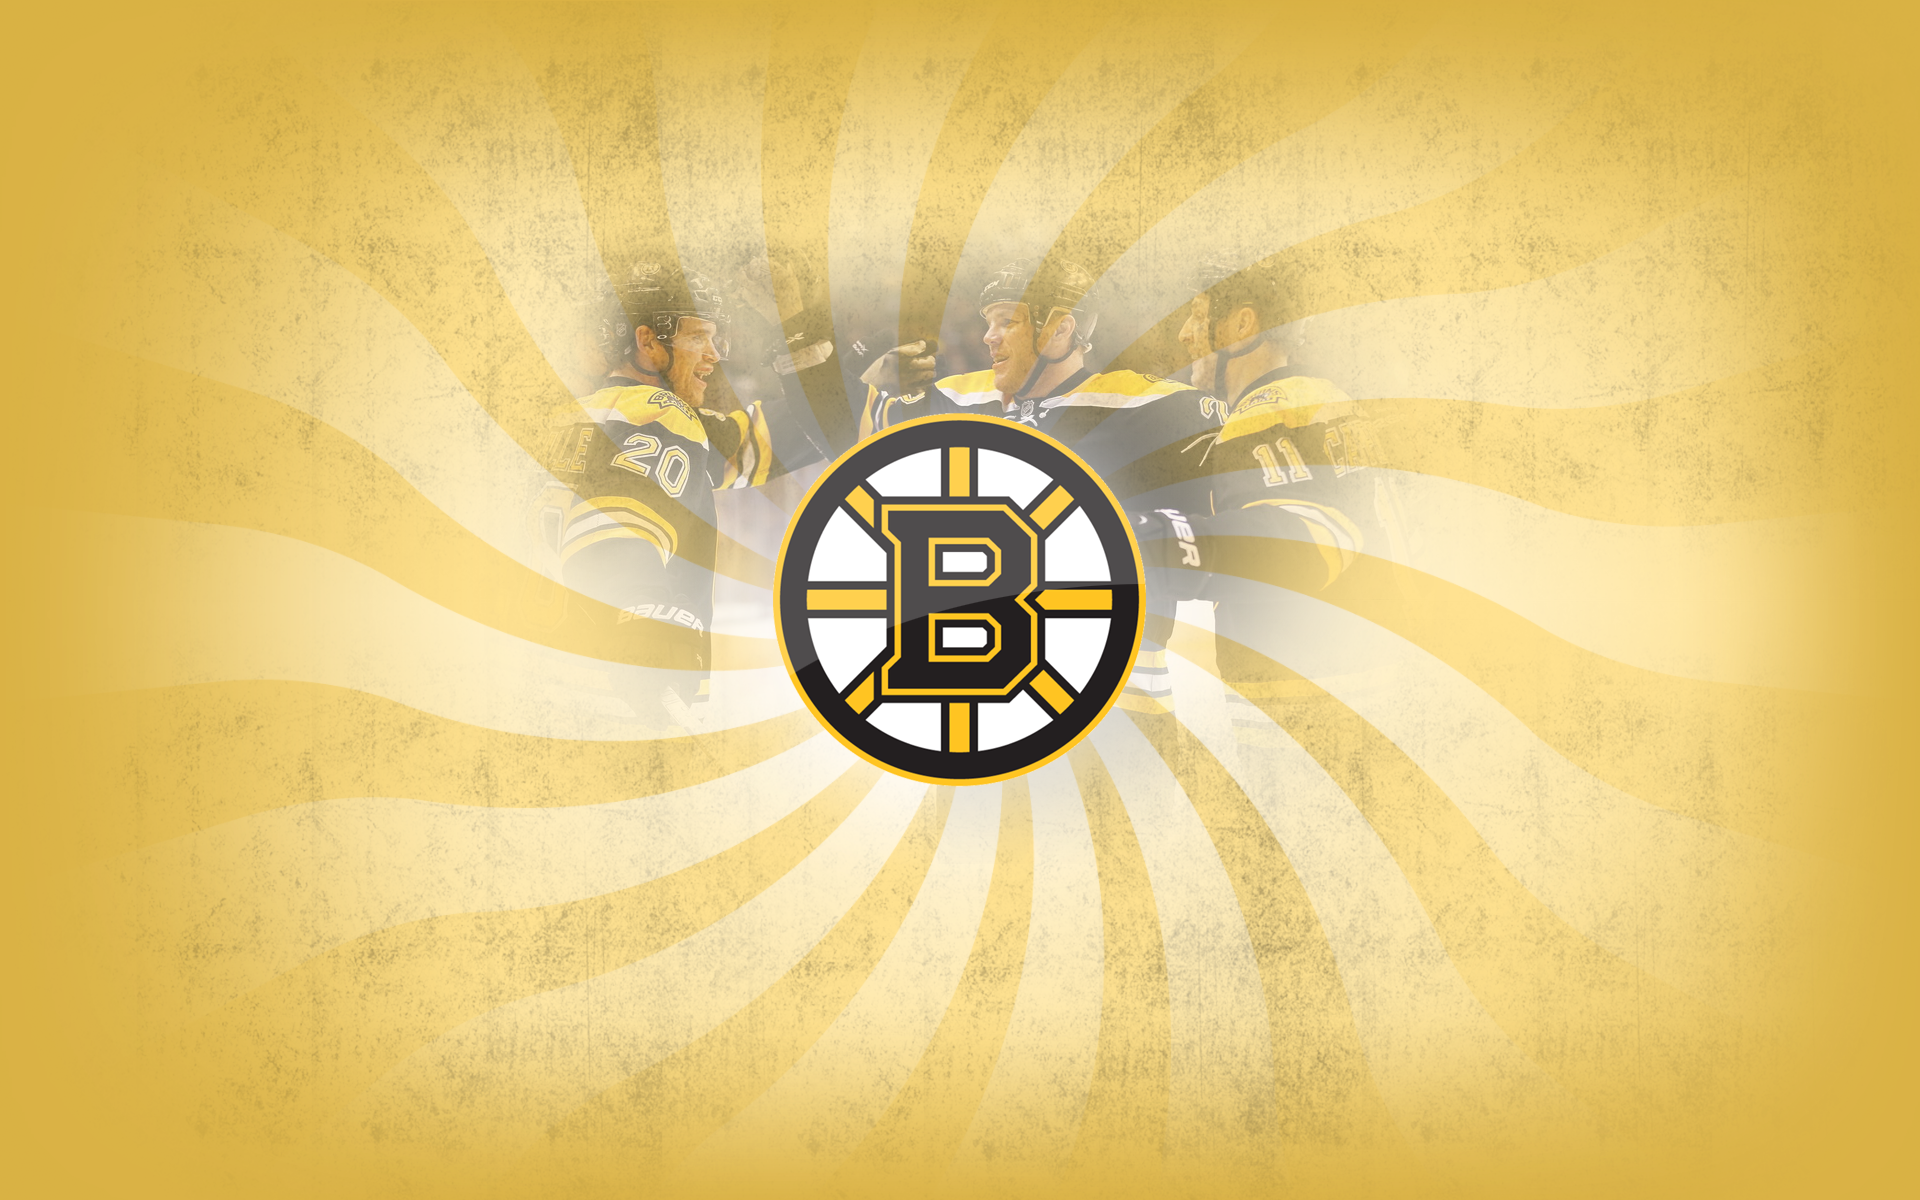 Boston Bruins Wallpaper 1 by TheYuhau on DeviantArt